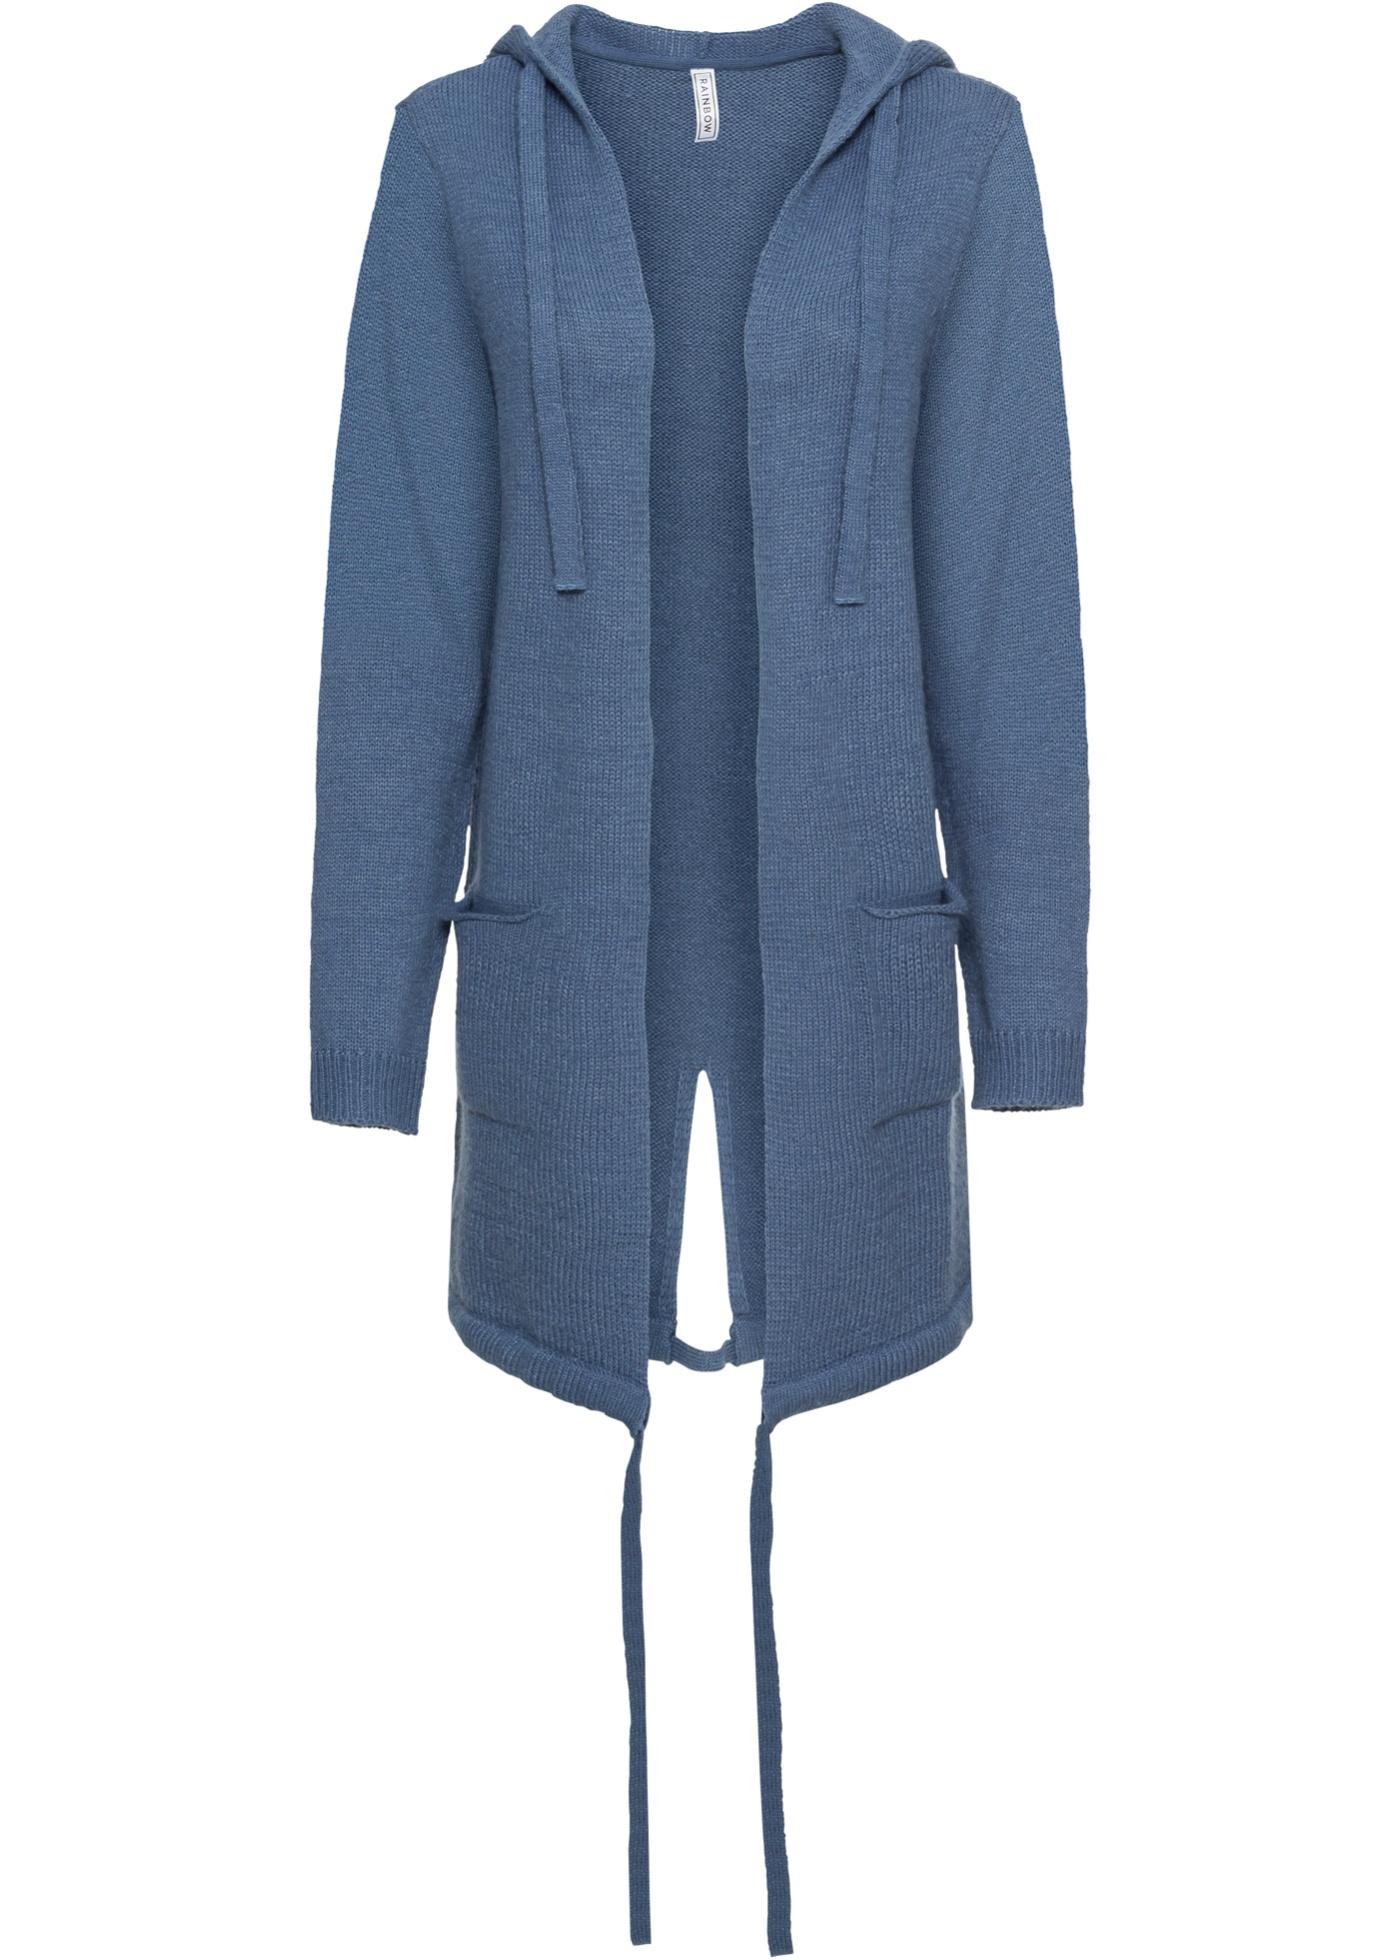 Pletený kabátek s kapsami a kapucí - Modrá